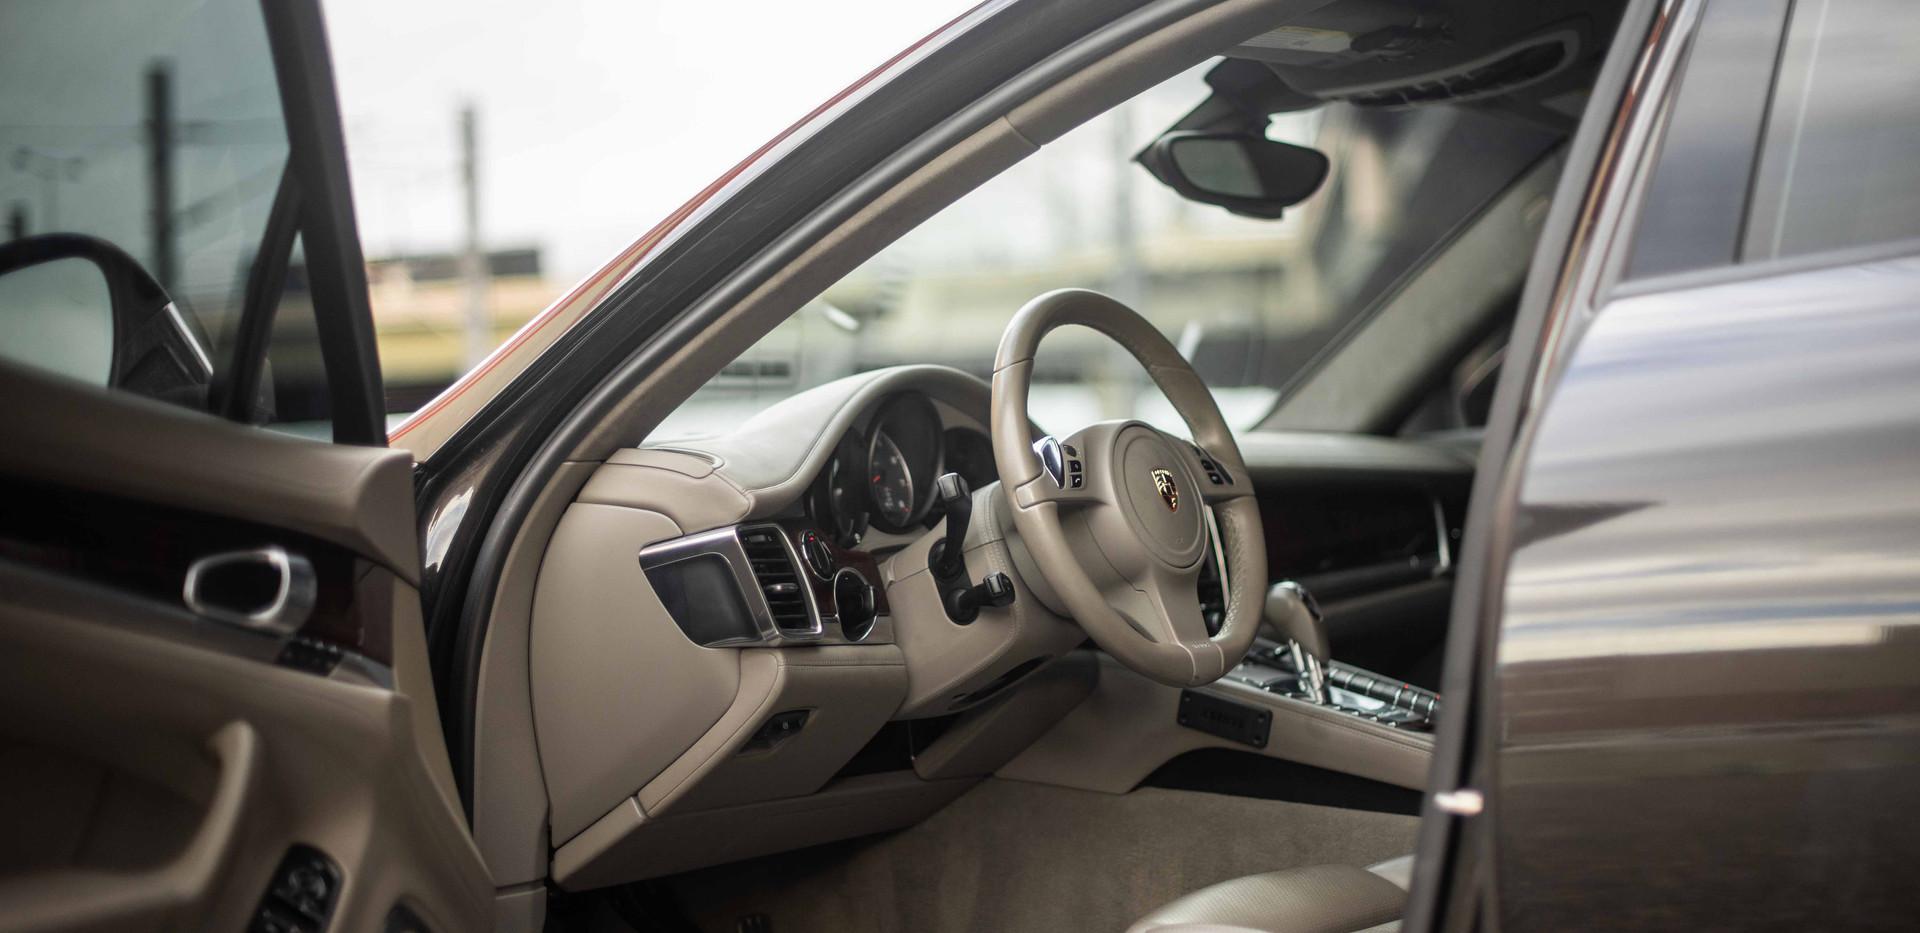 Interior_Driver_Front_Panamara.jpg